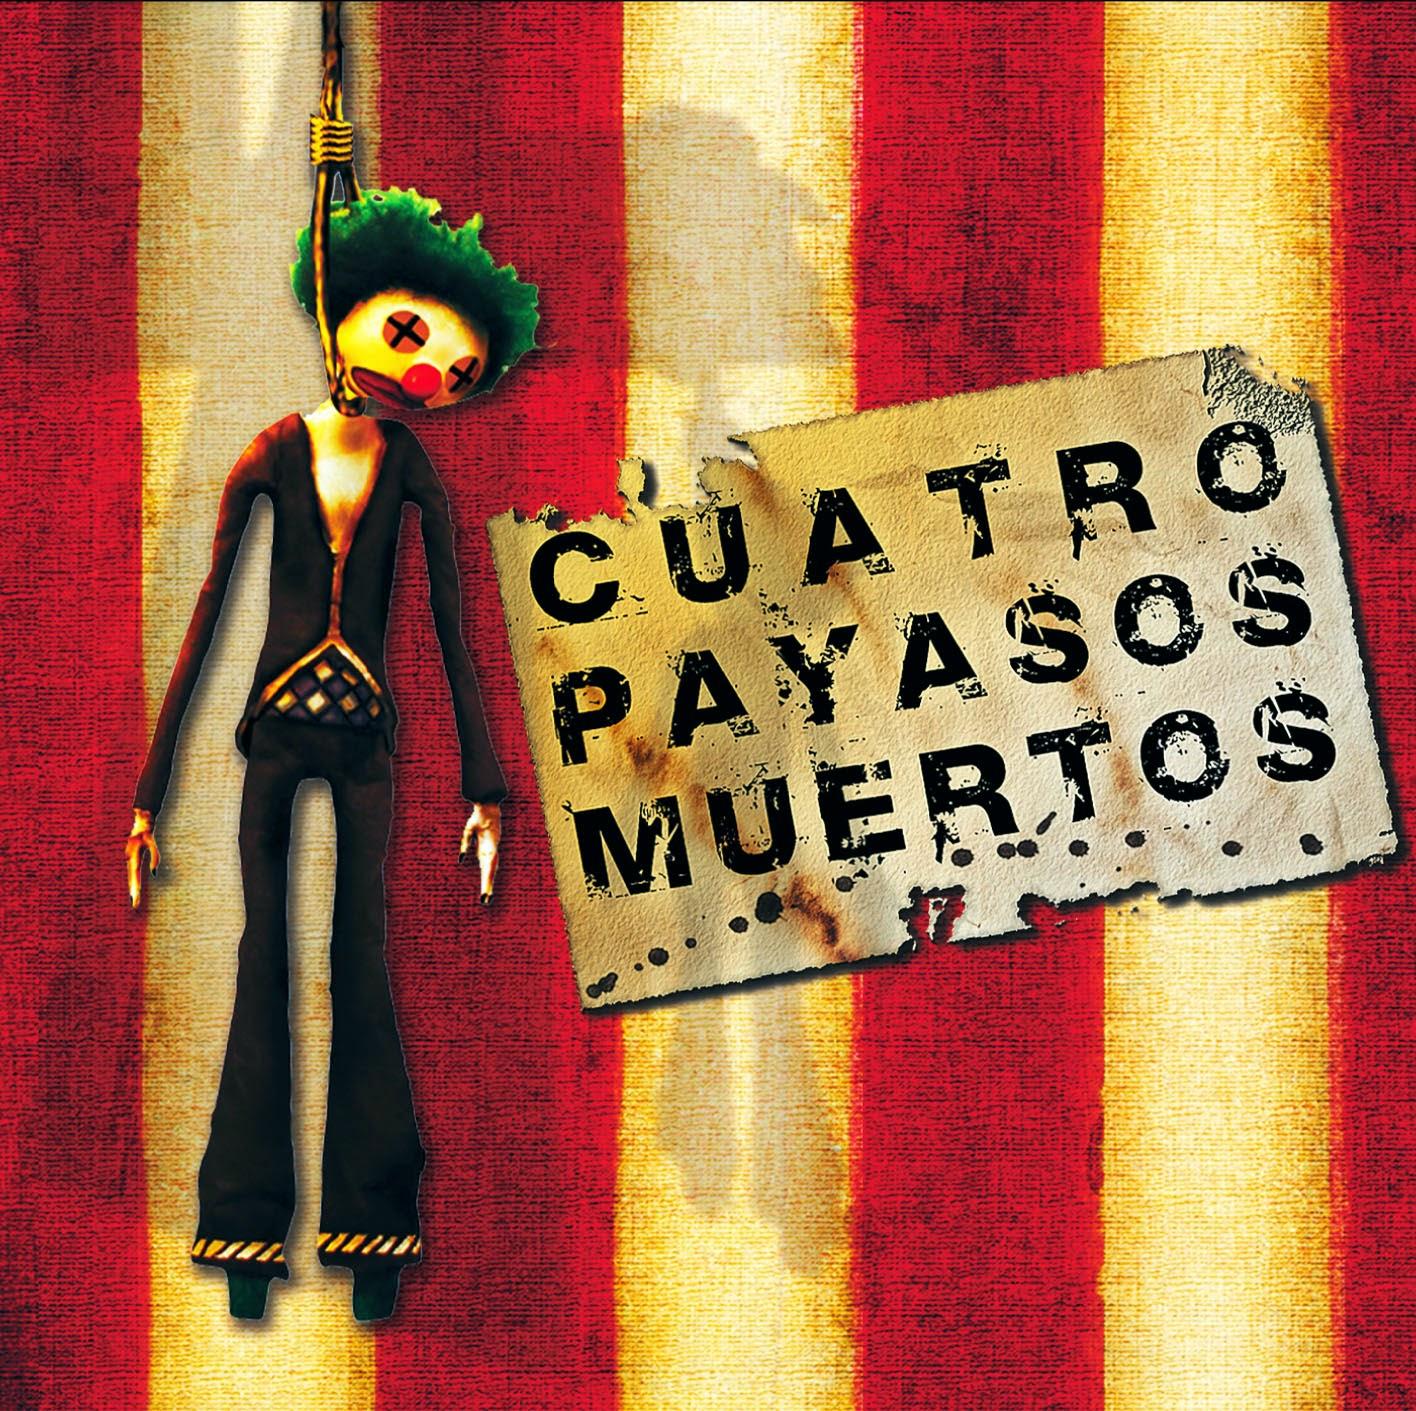 CUATRO PAYASOS MUERTOS - Cuatro Payasos Muertos